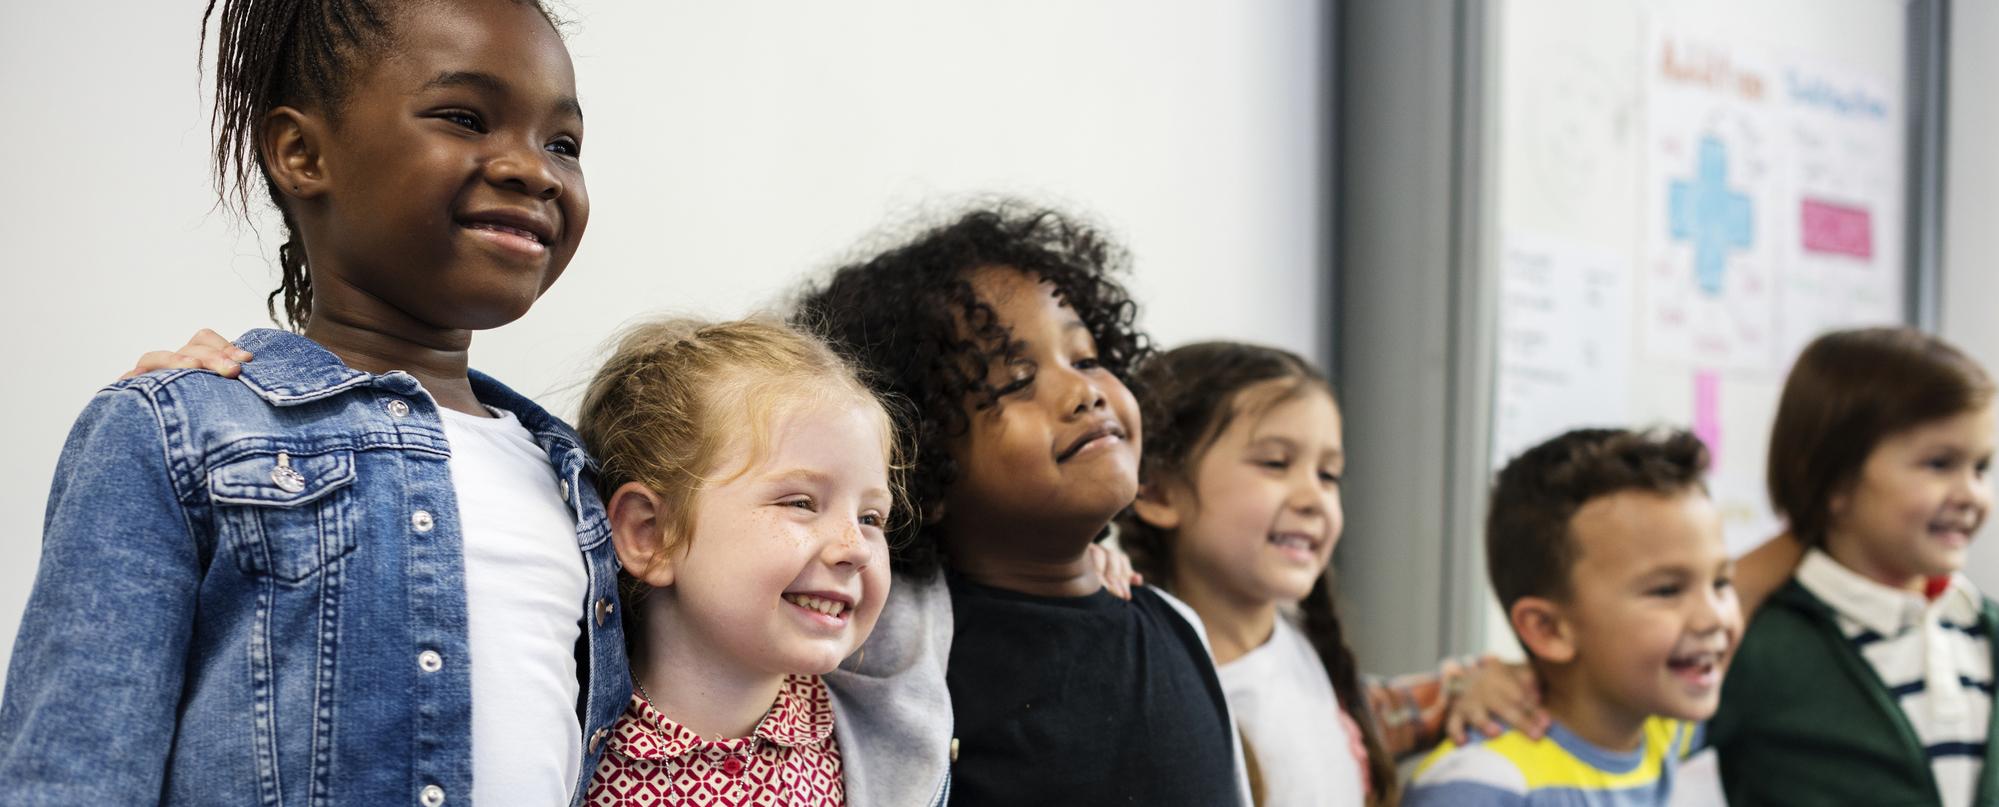 Photo of happy kids at elementary school